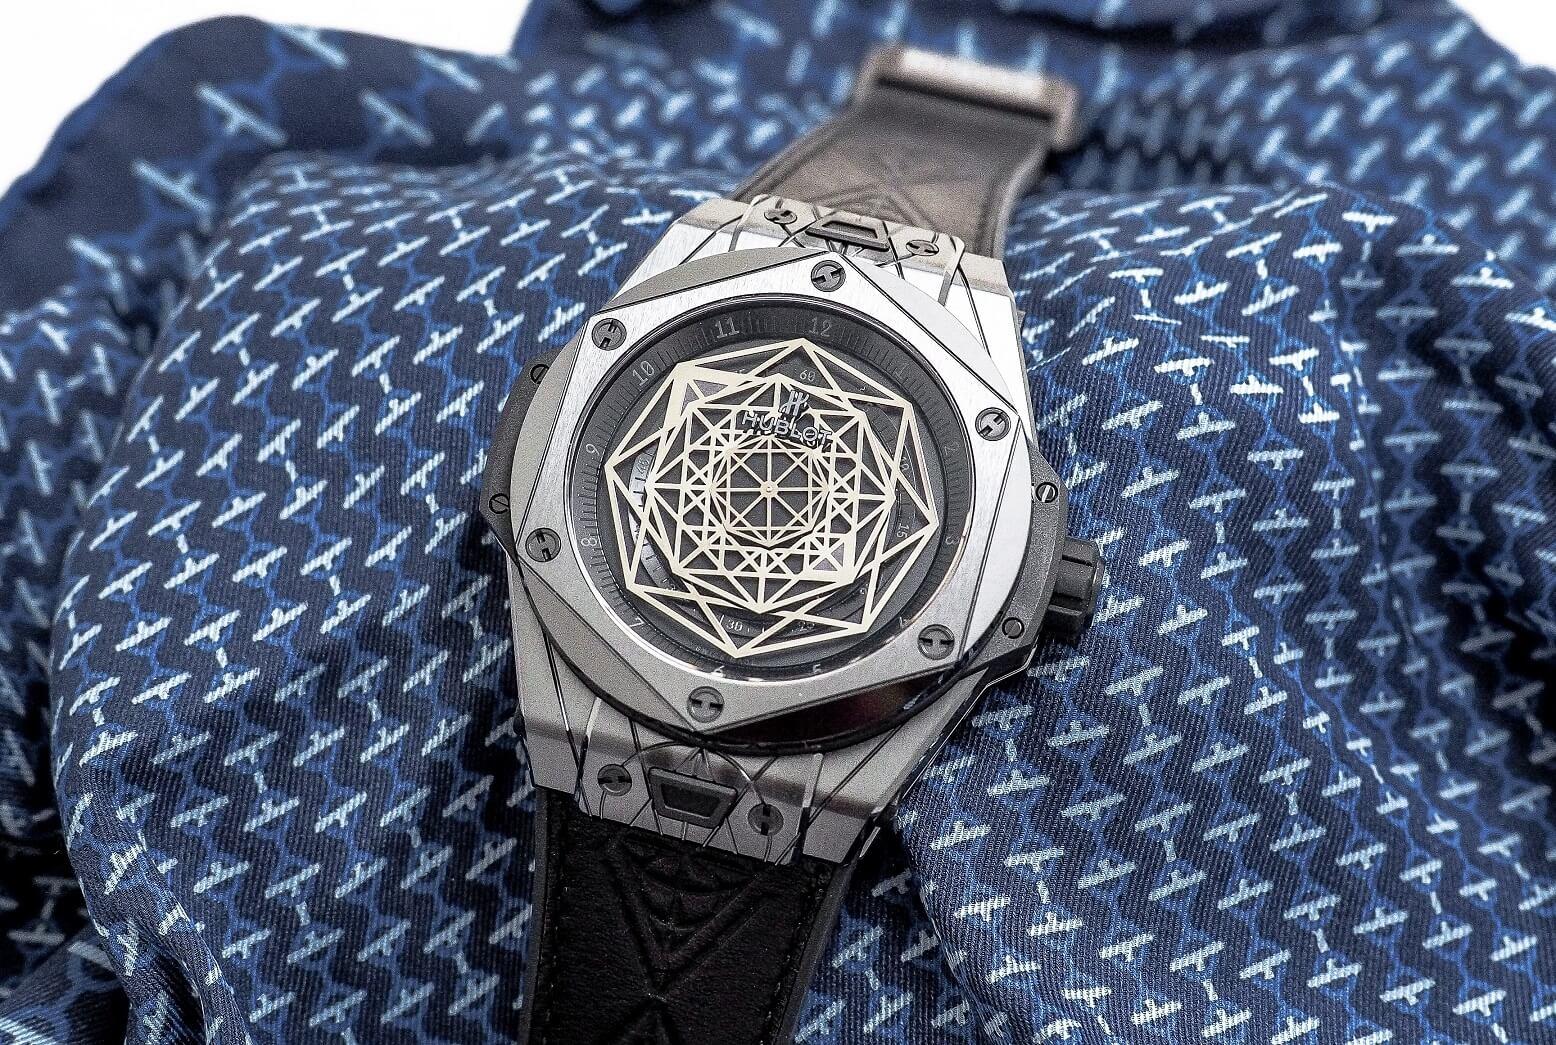 Hublot Big Bang Sang Bleu 415.CX.1114.VR.MXM17 Manual winding Ceramic Case Leather bracelet Men's watch/Unisex Leather bracelet Luminescent Hands Power Reserve Display